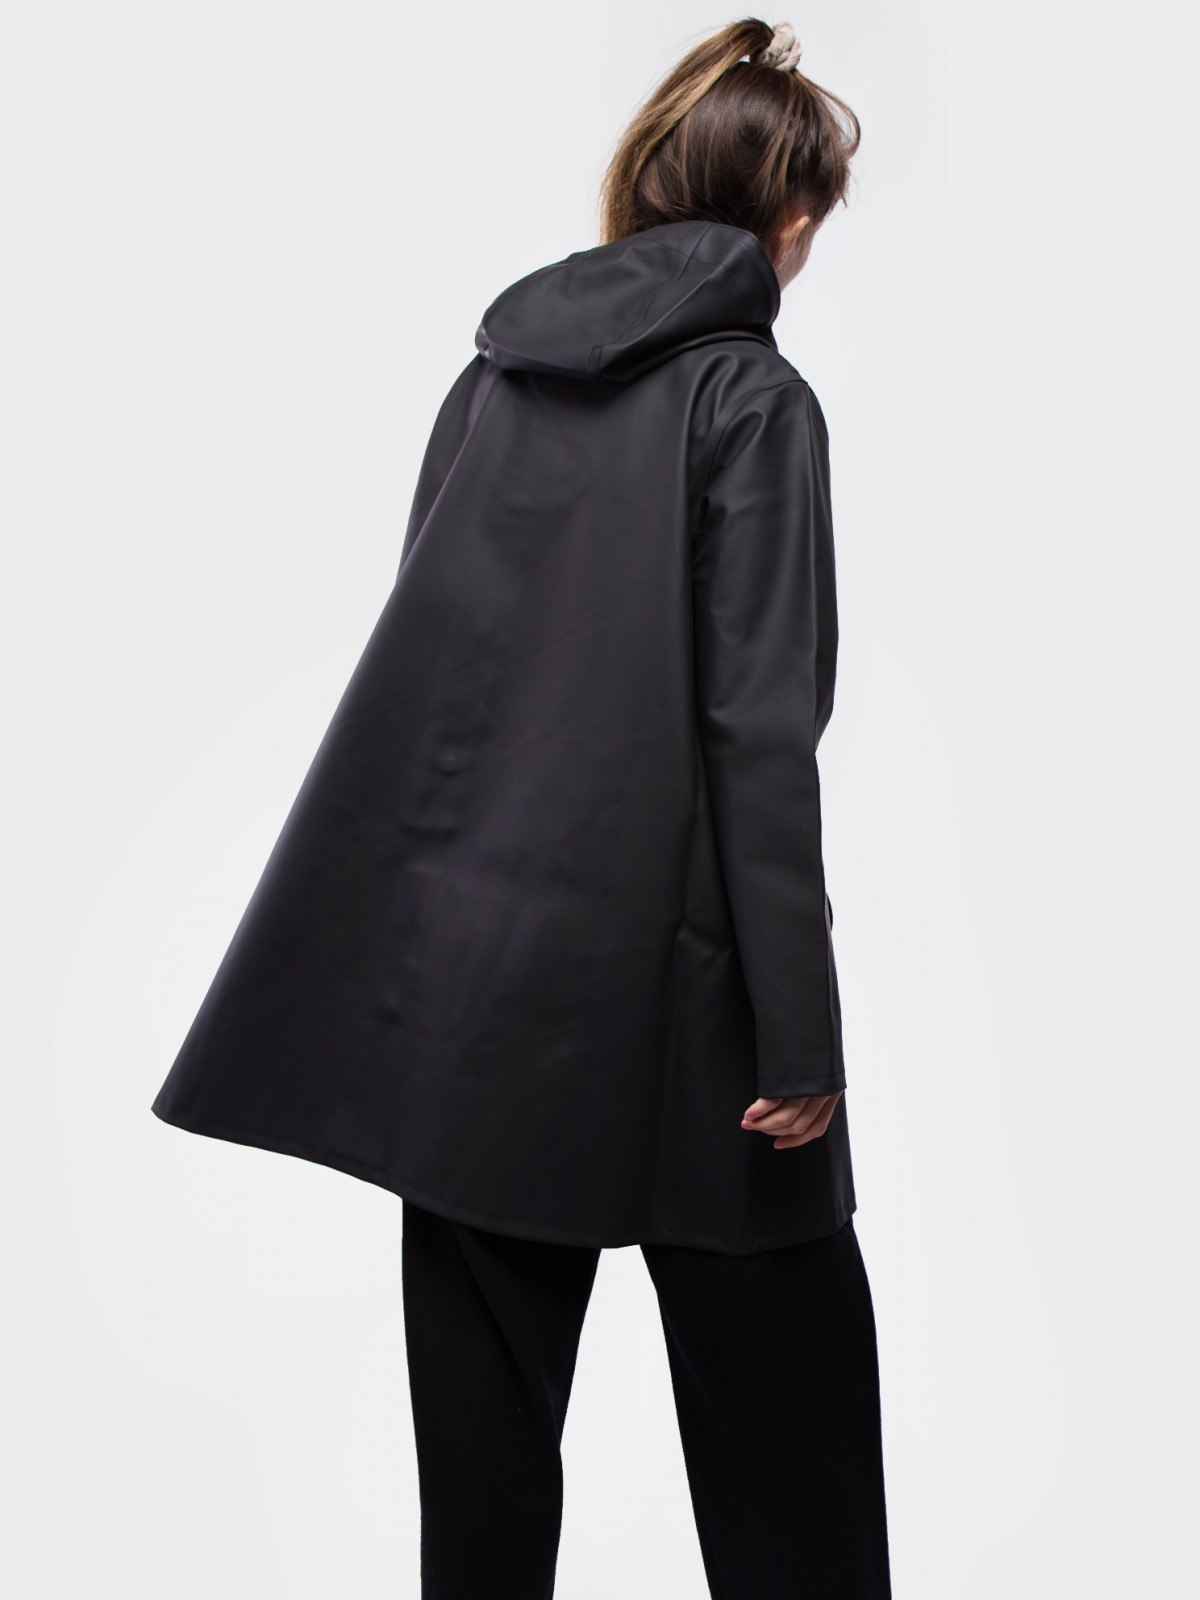 Stutterheim Mosebacke Raincoat in Black